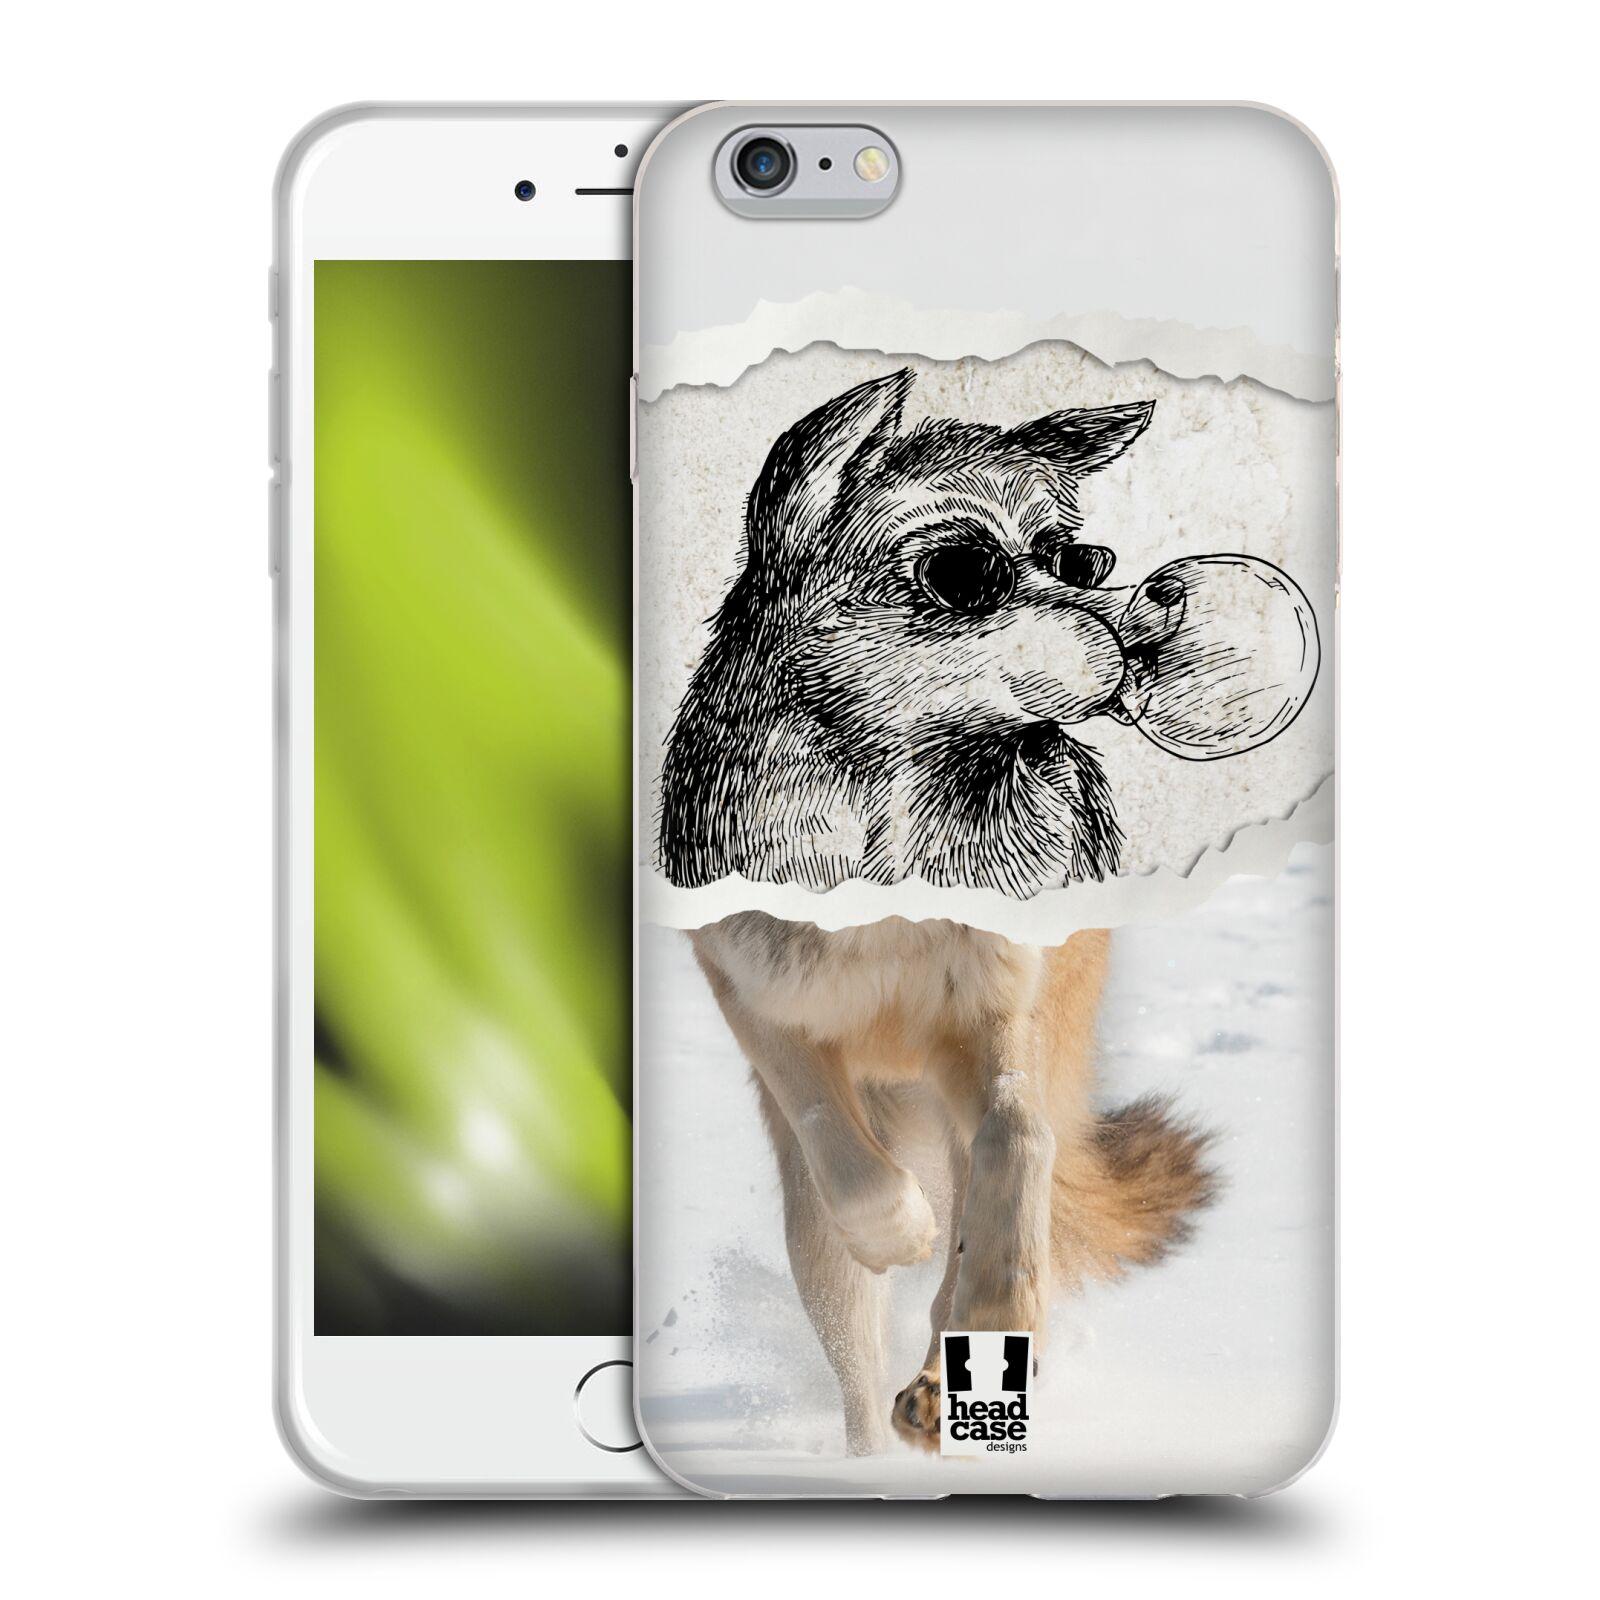 HEAD CASE silikonový obal na mobil Apple Iphone 6 PLUS/ 6S PLUS vzor zvířata koláž vlk pohodář